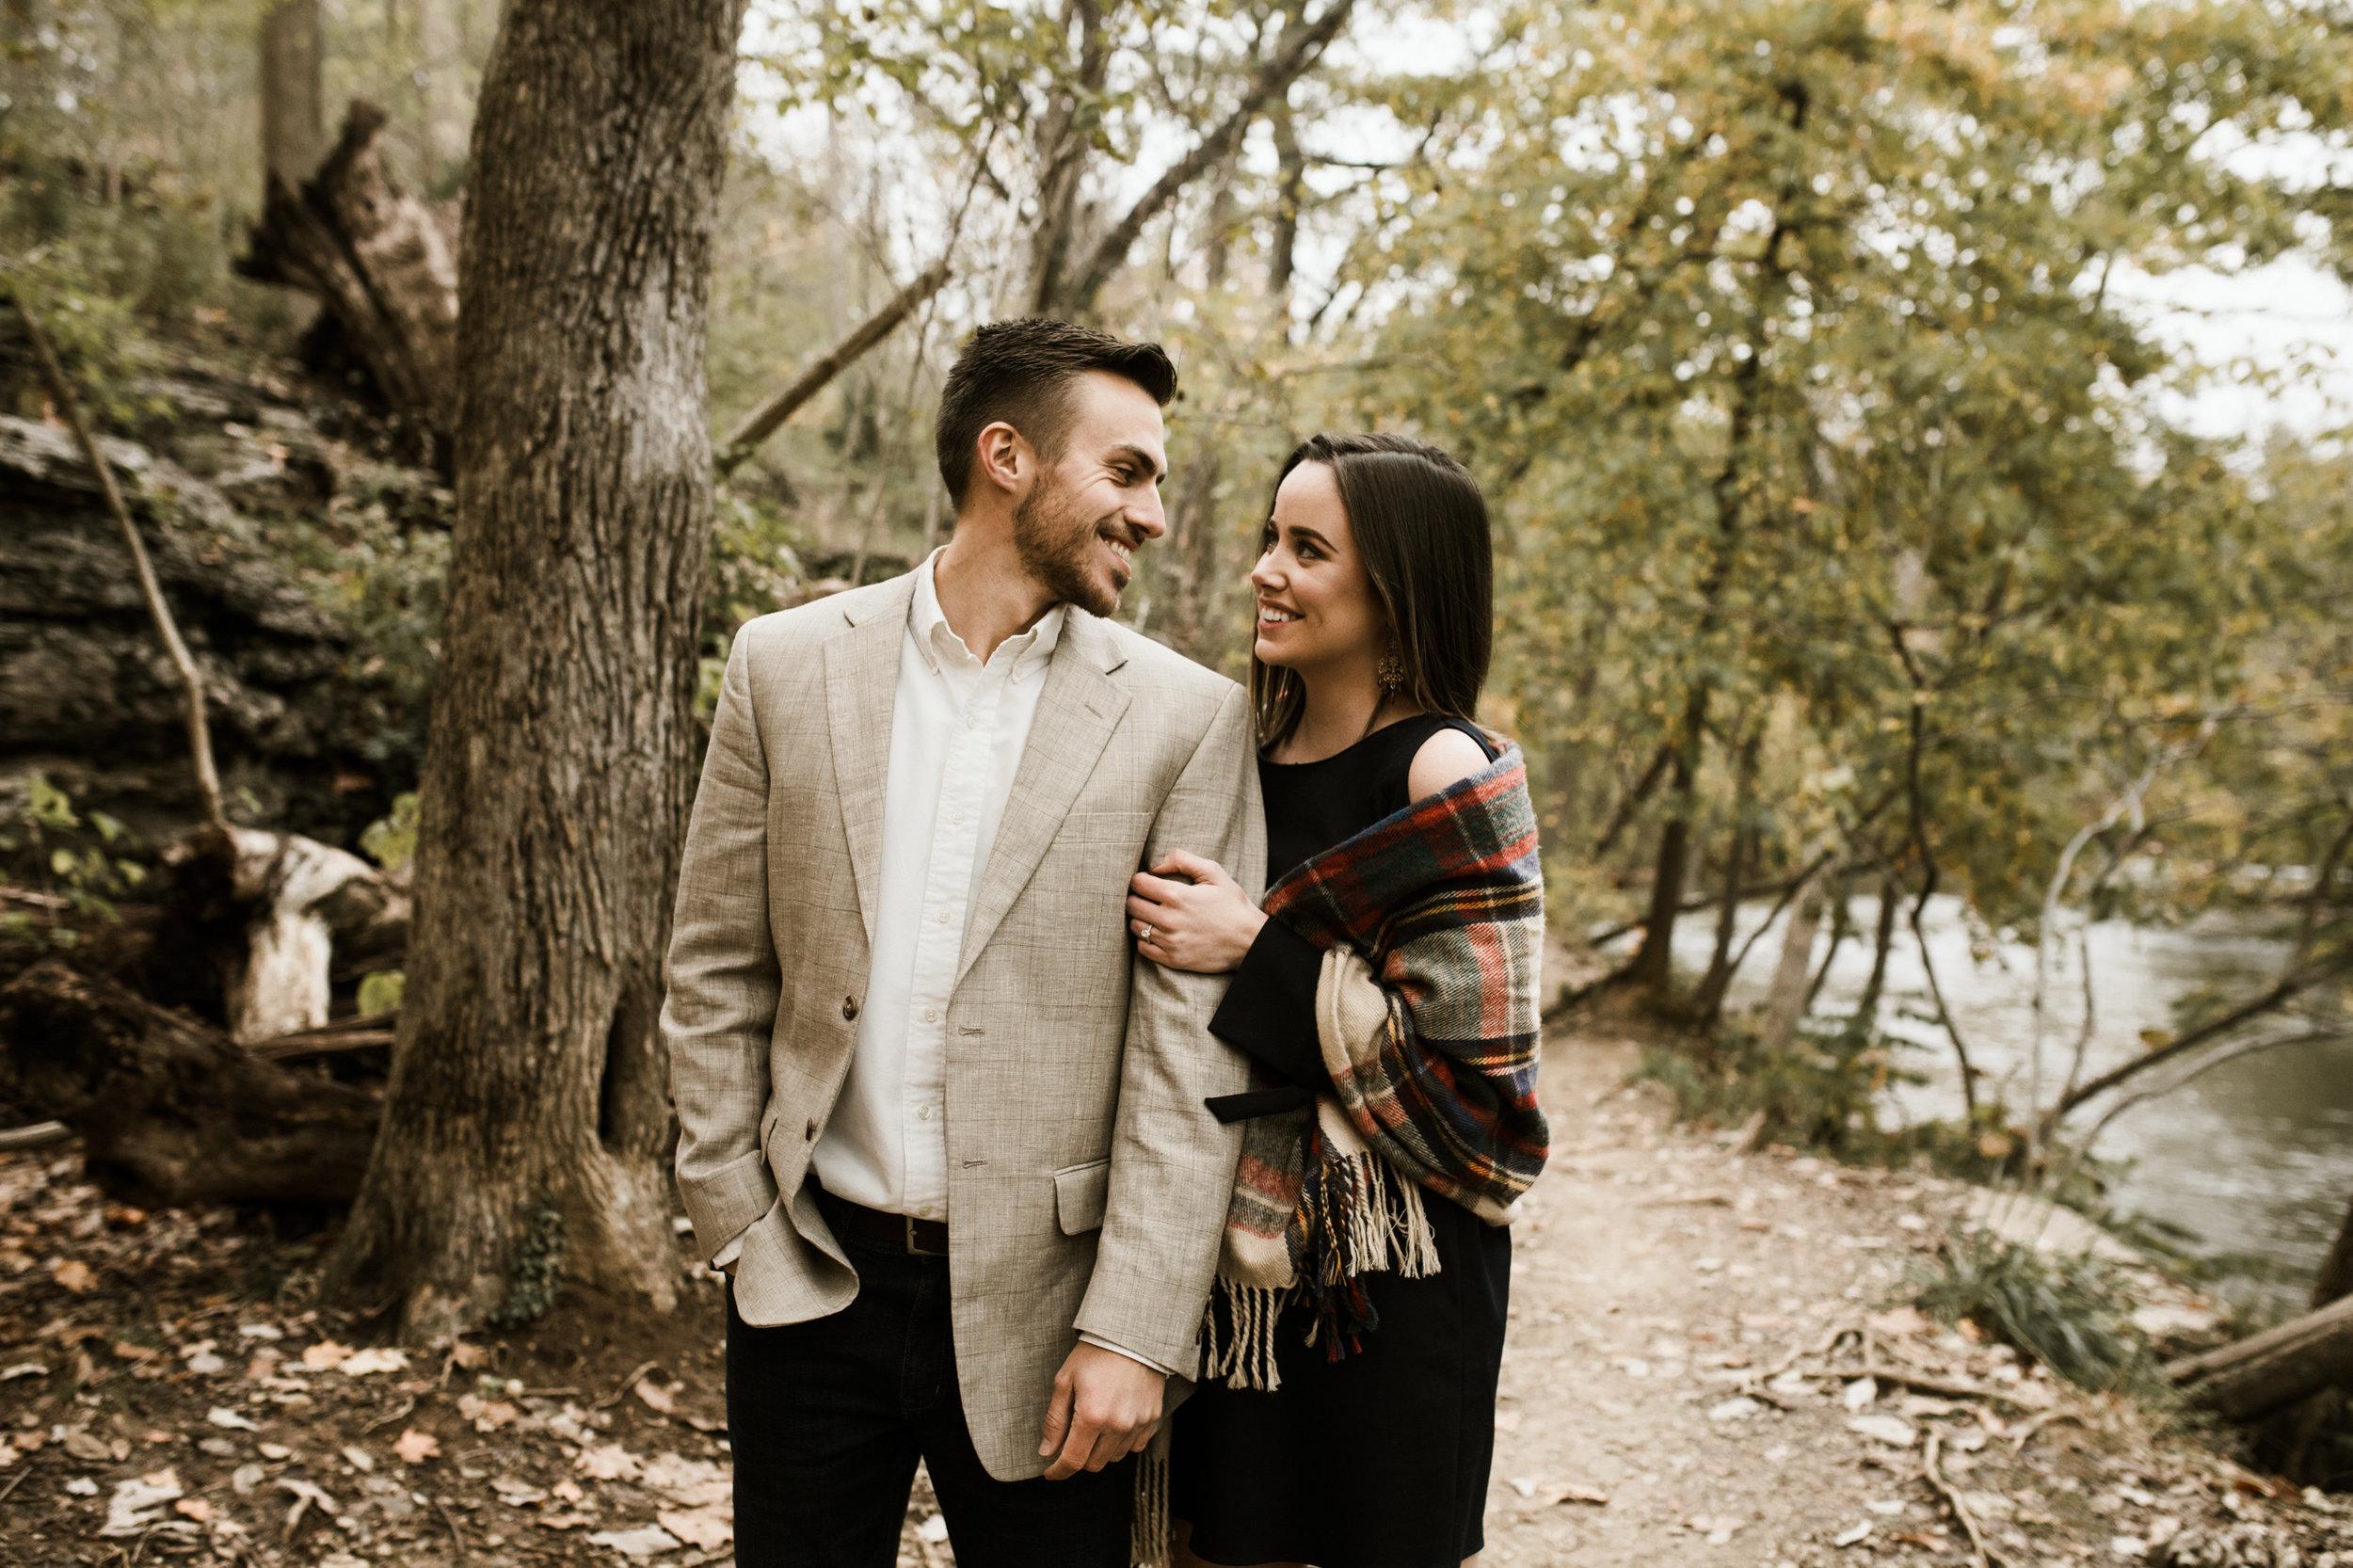 Kelsey and Daniel Engagement 2018 Crystal Ludwick Photo Louisville Wedding Photographer Kentucky Wedding Photographer (21 of 31).jpg